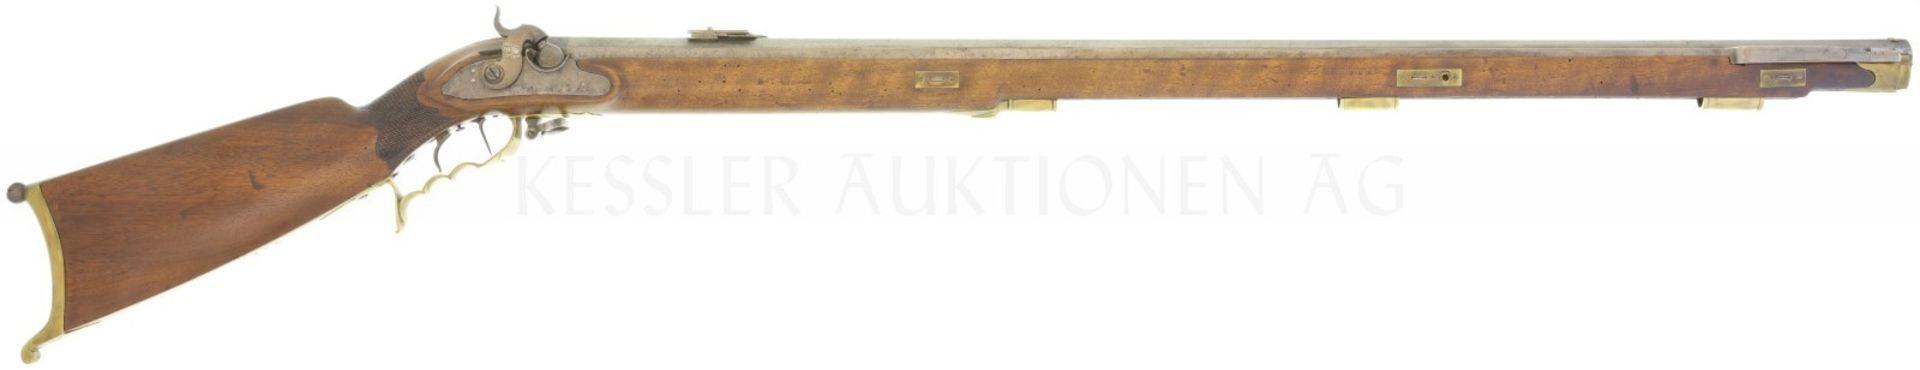 Perkussionsstutzer 1838, Aargau, Kal. 16mm